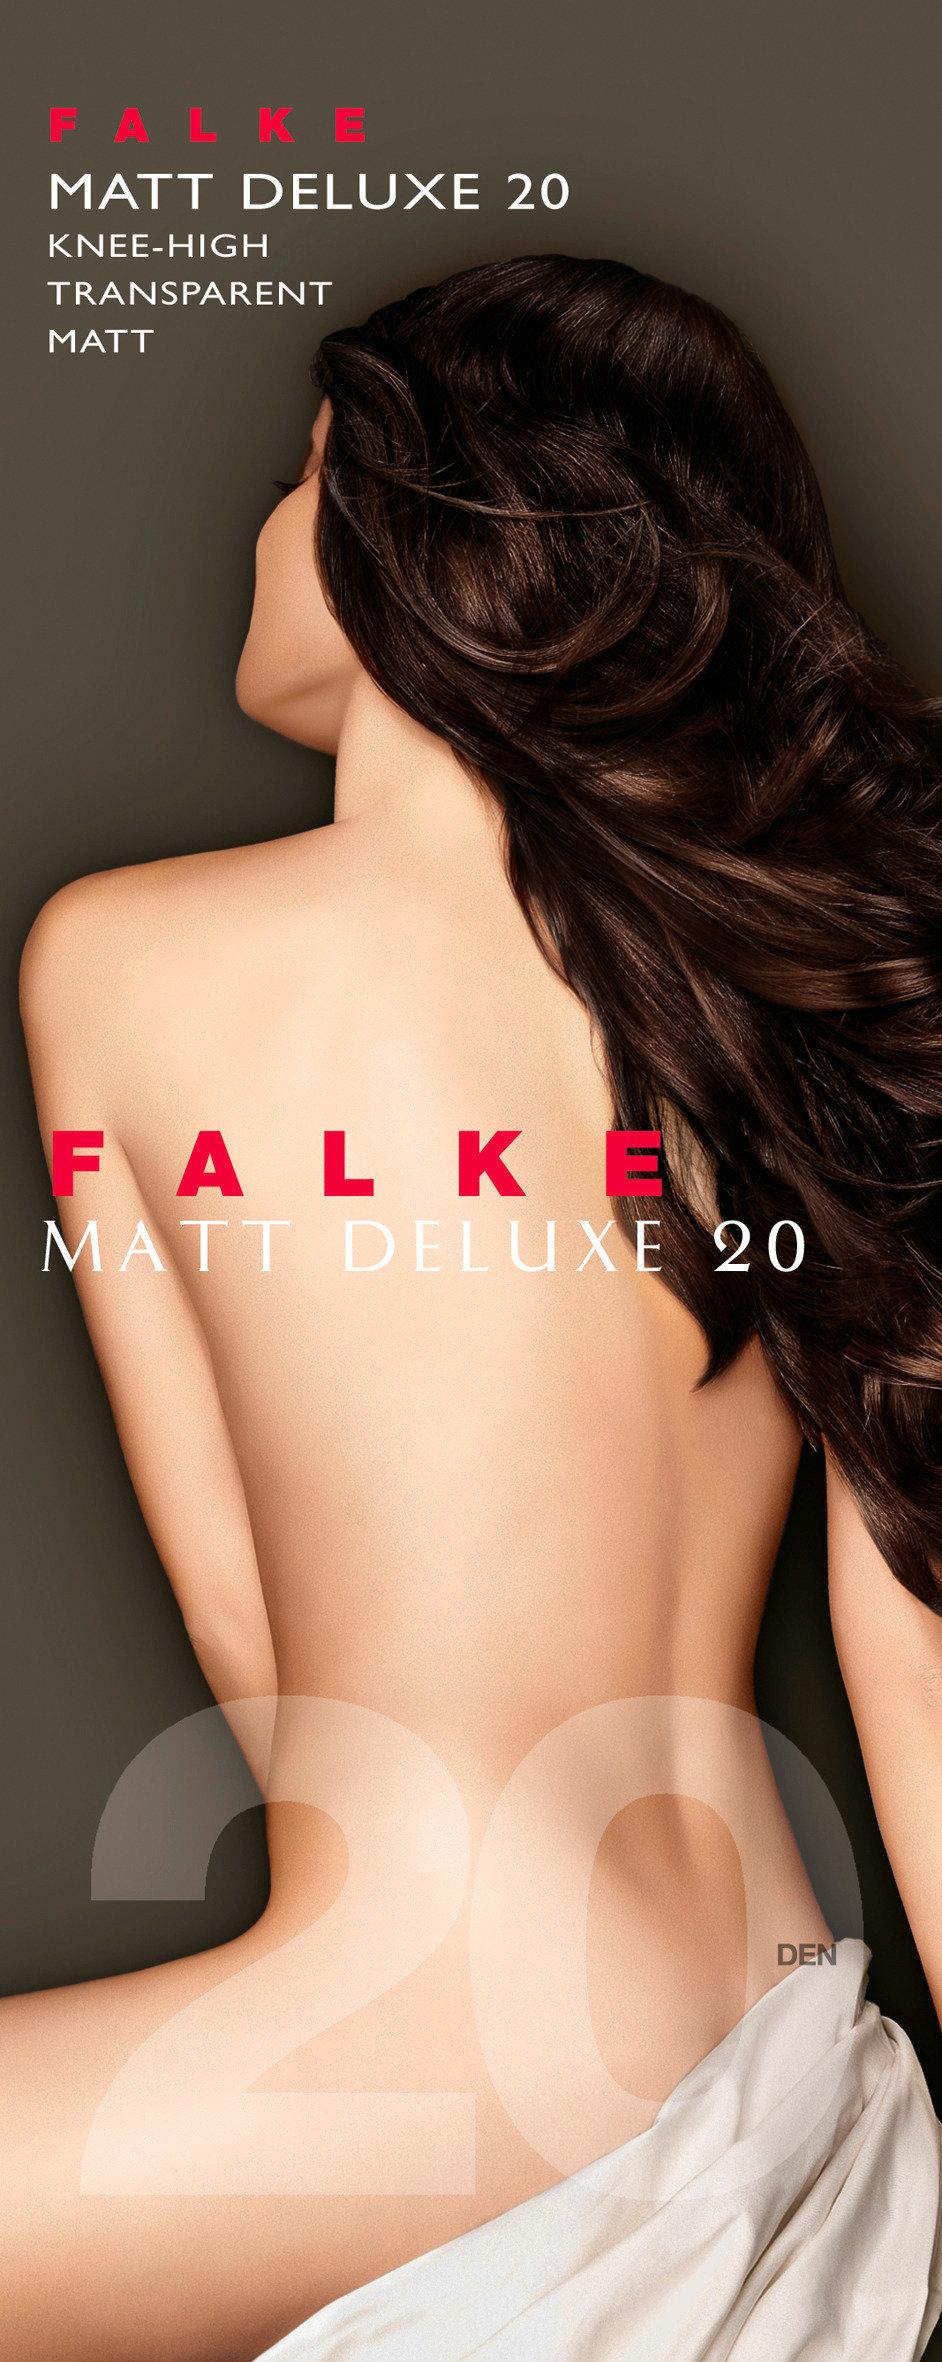 FALKE Matt Deluxe 20 DEN Damen Kniestrümpfe ANTHRACITE